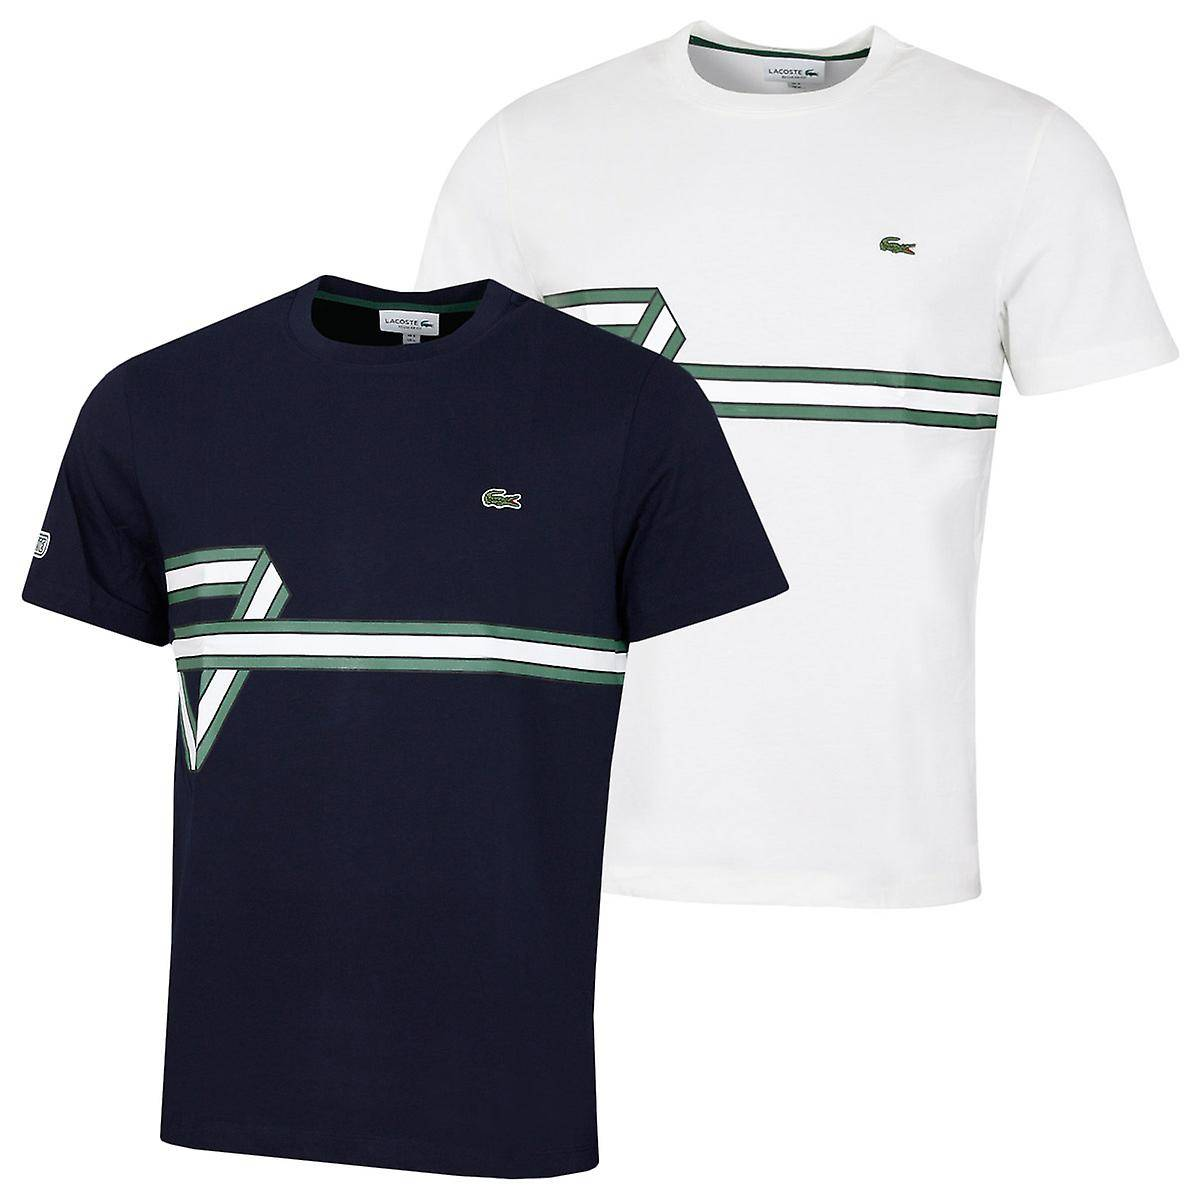 Lacoste Mens 2020 TH5166 Ribbed Collar Cotton Crocodile Ribbon T-Shirt Farine Size 3 - S